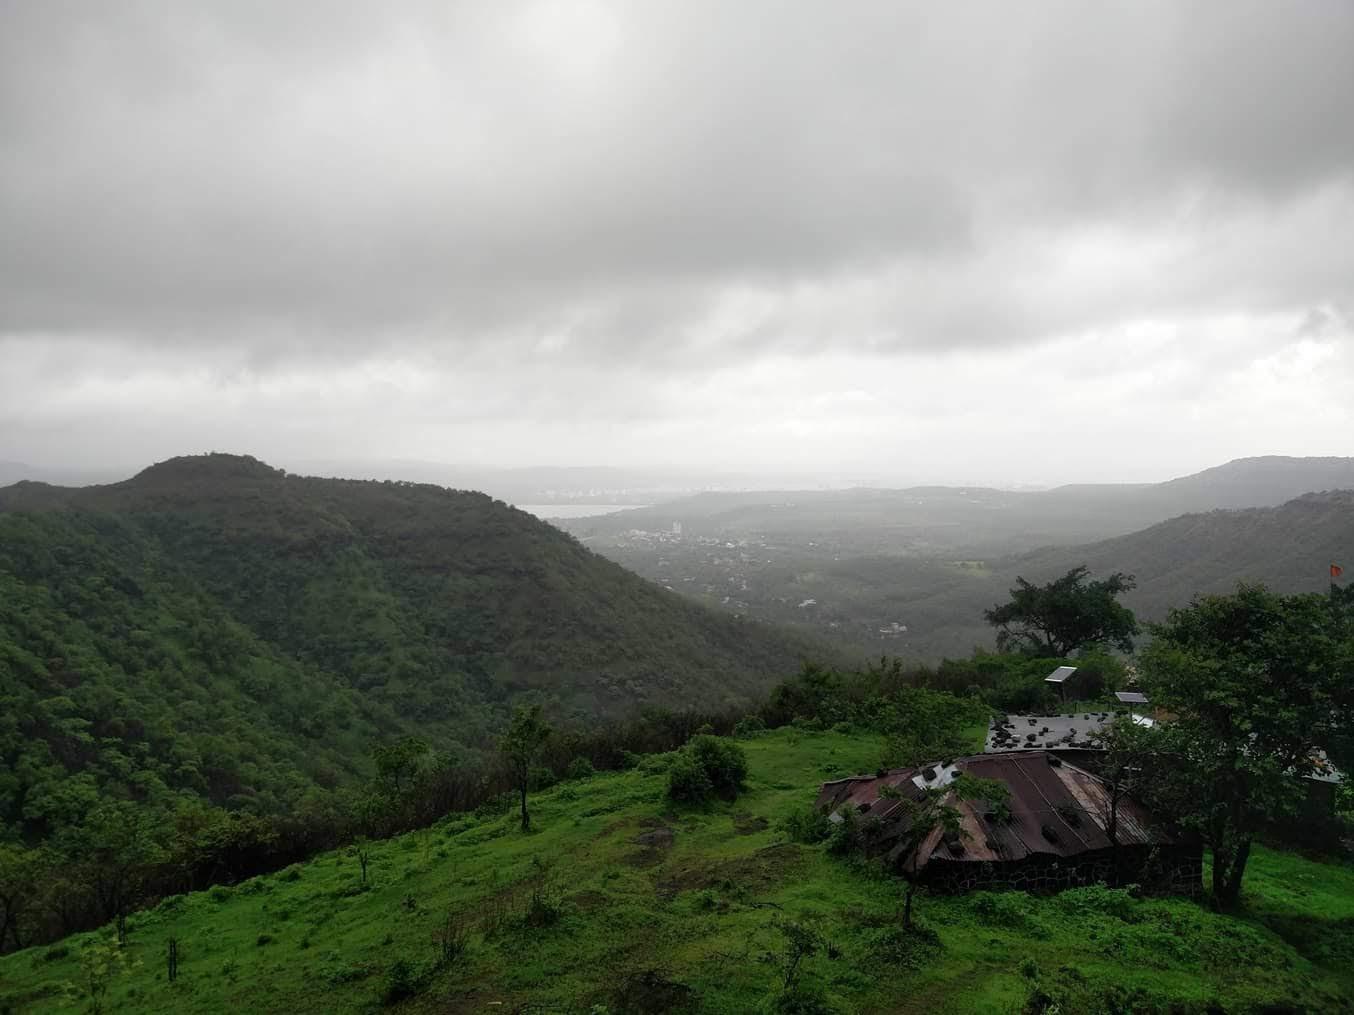 Singhgad Fort Pune during Monsoon